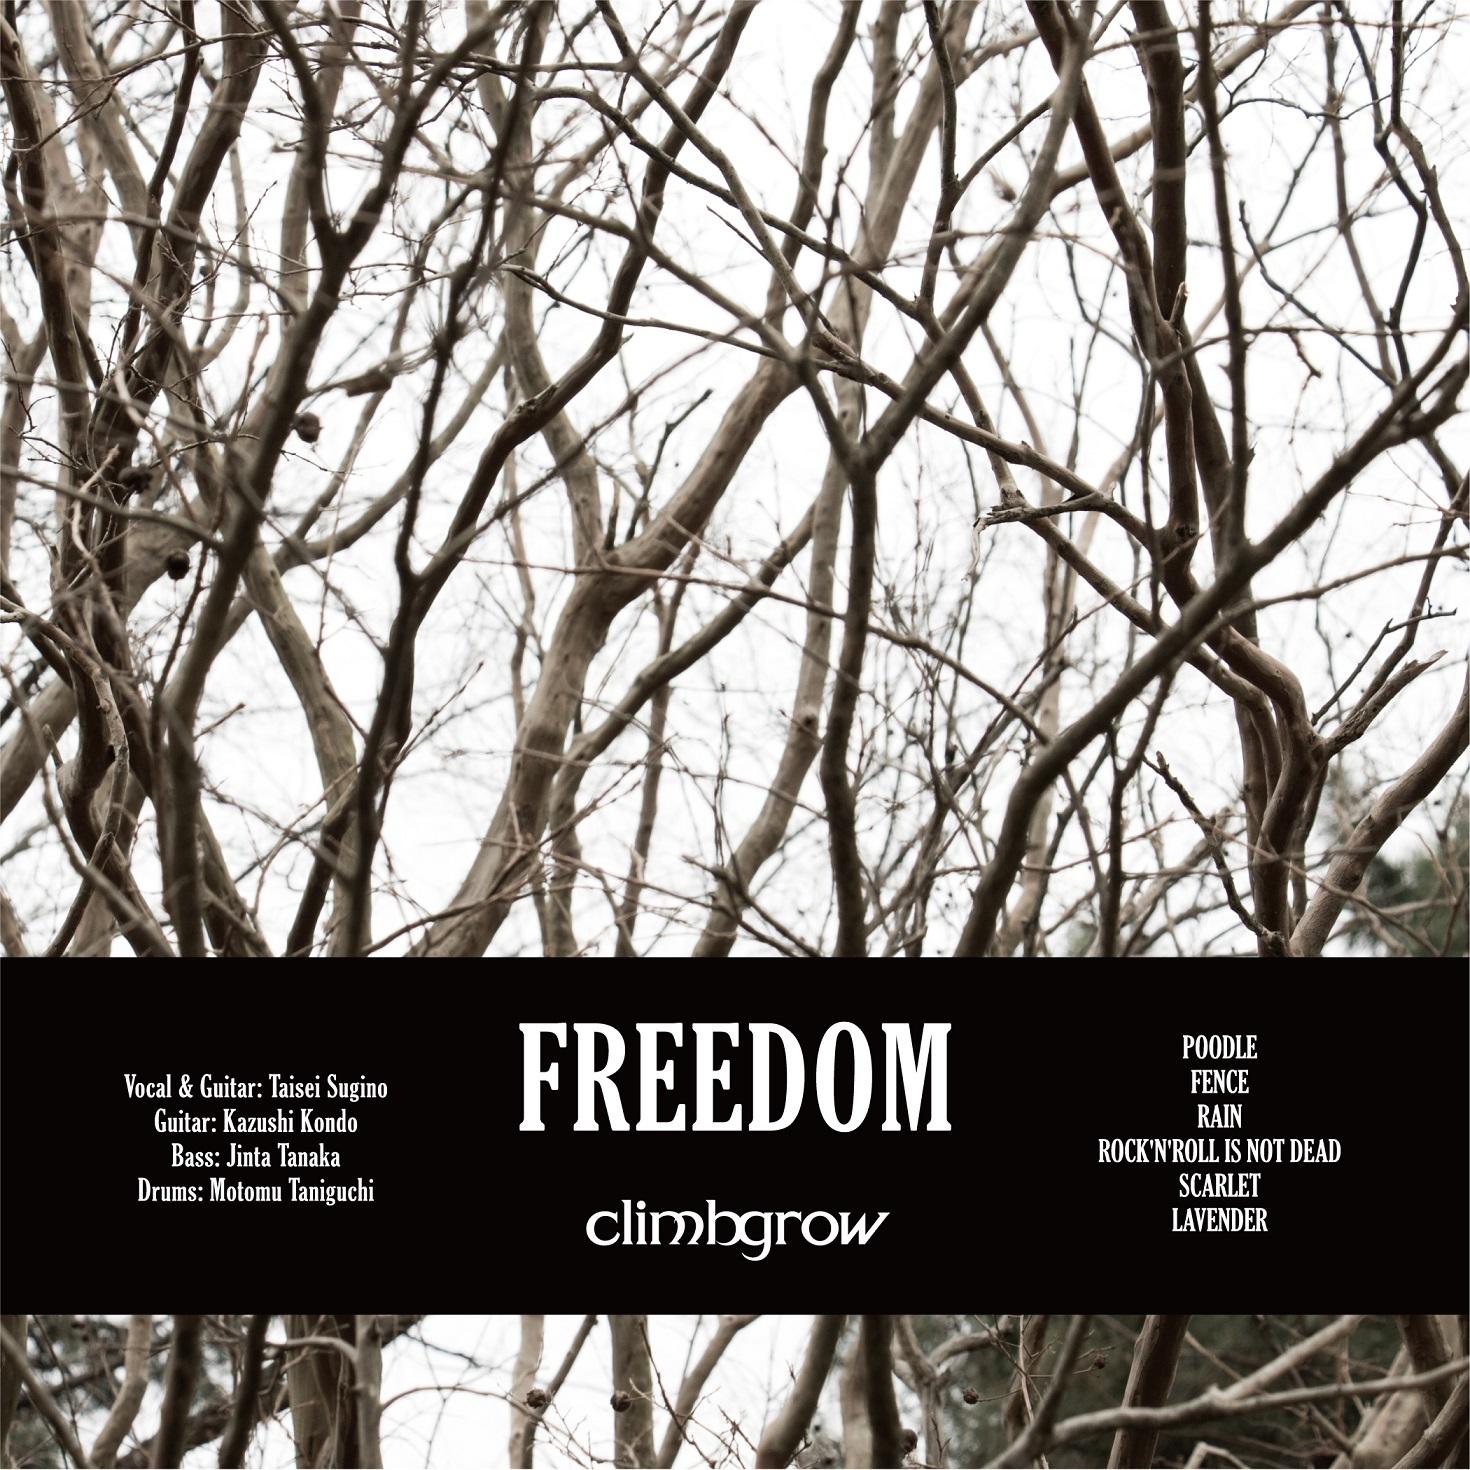 climbgrow『FREEDOM』